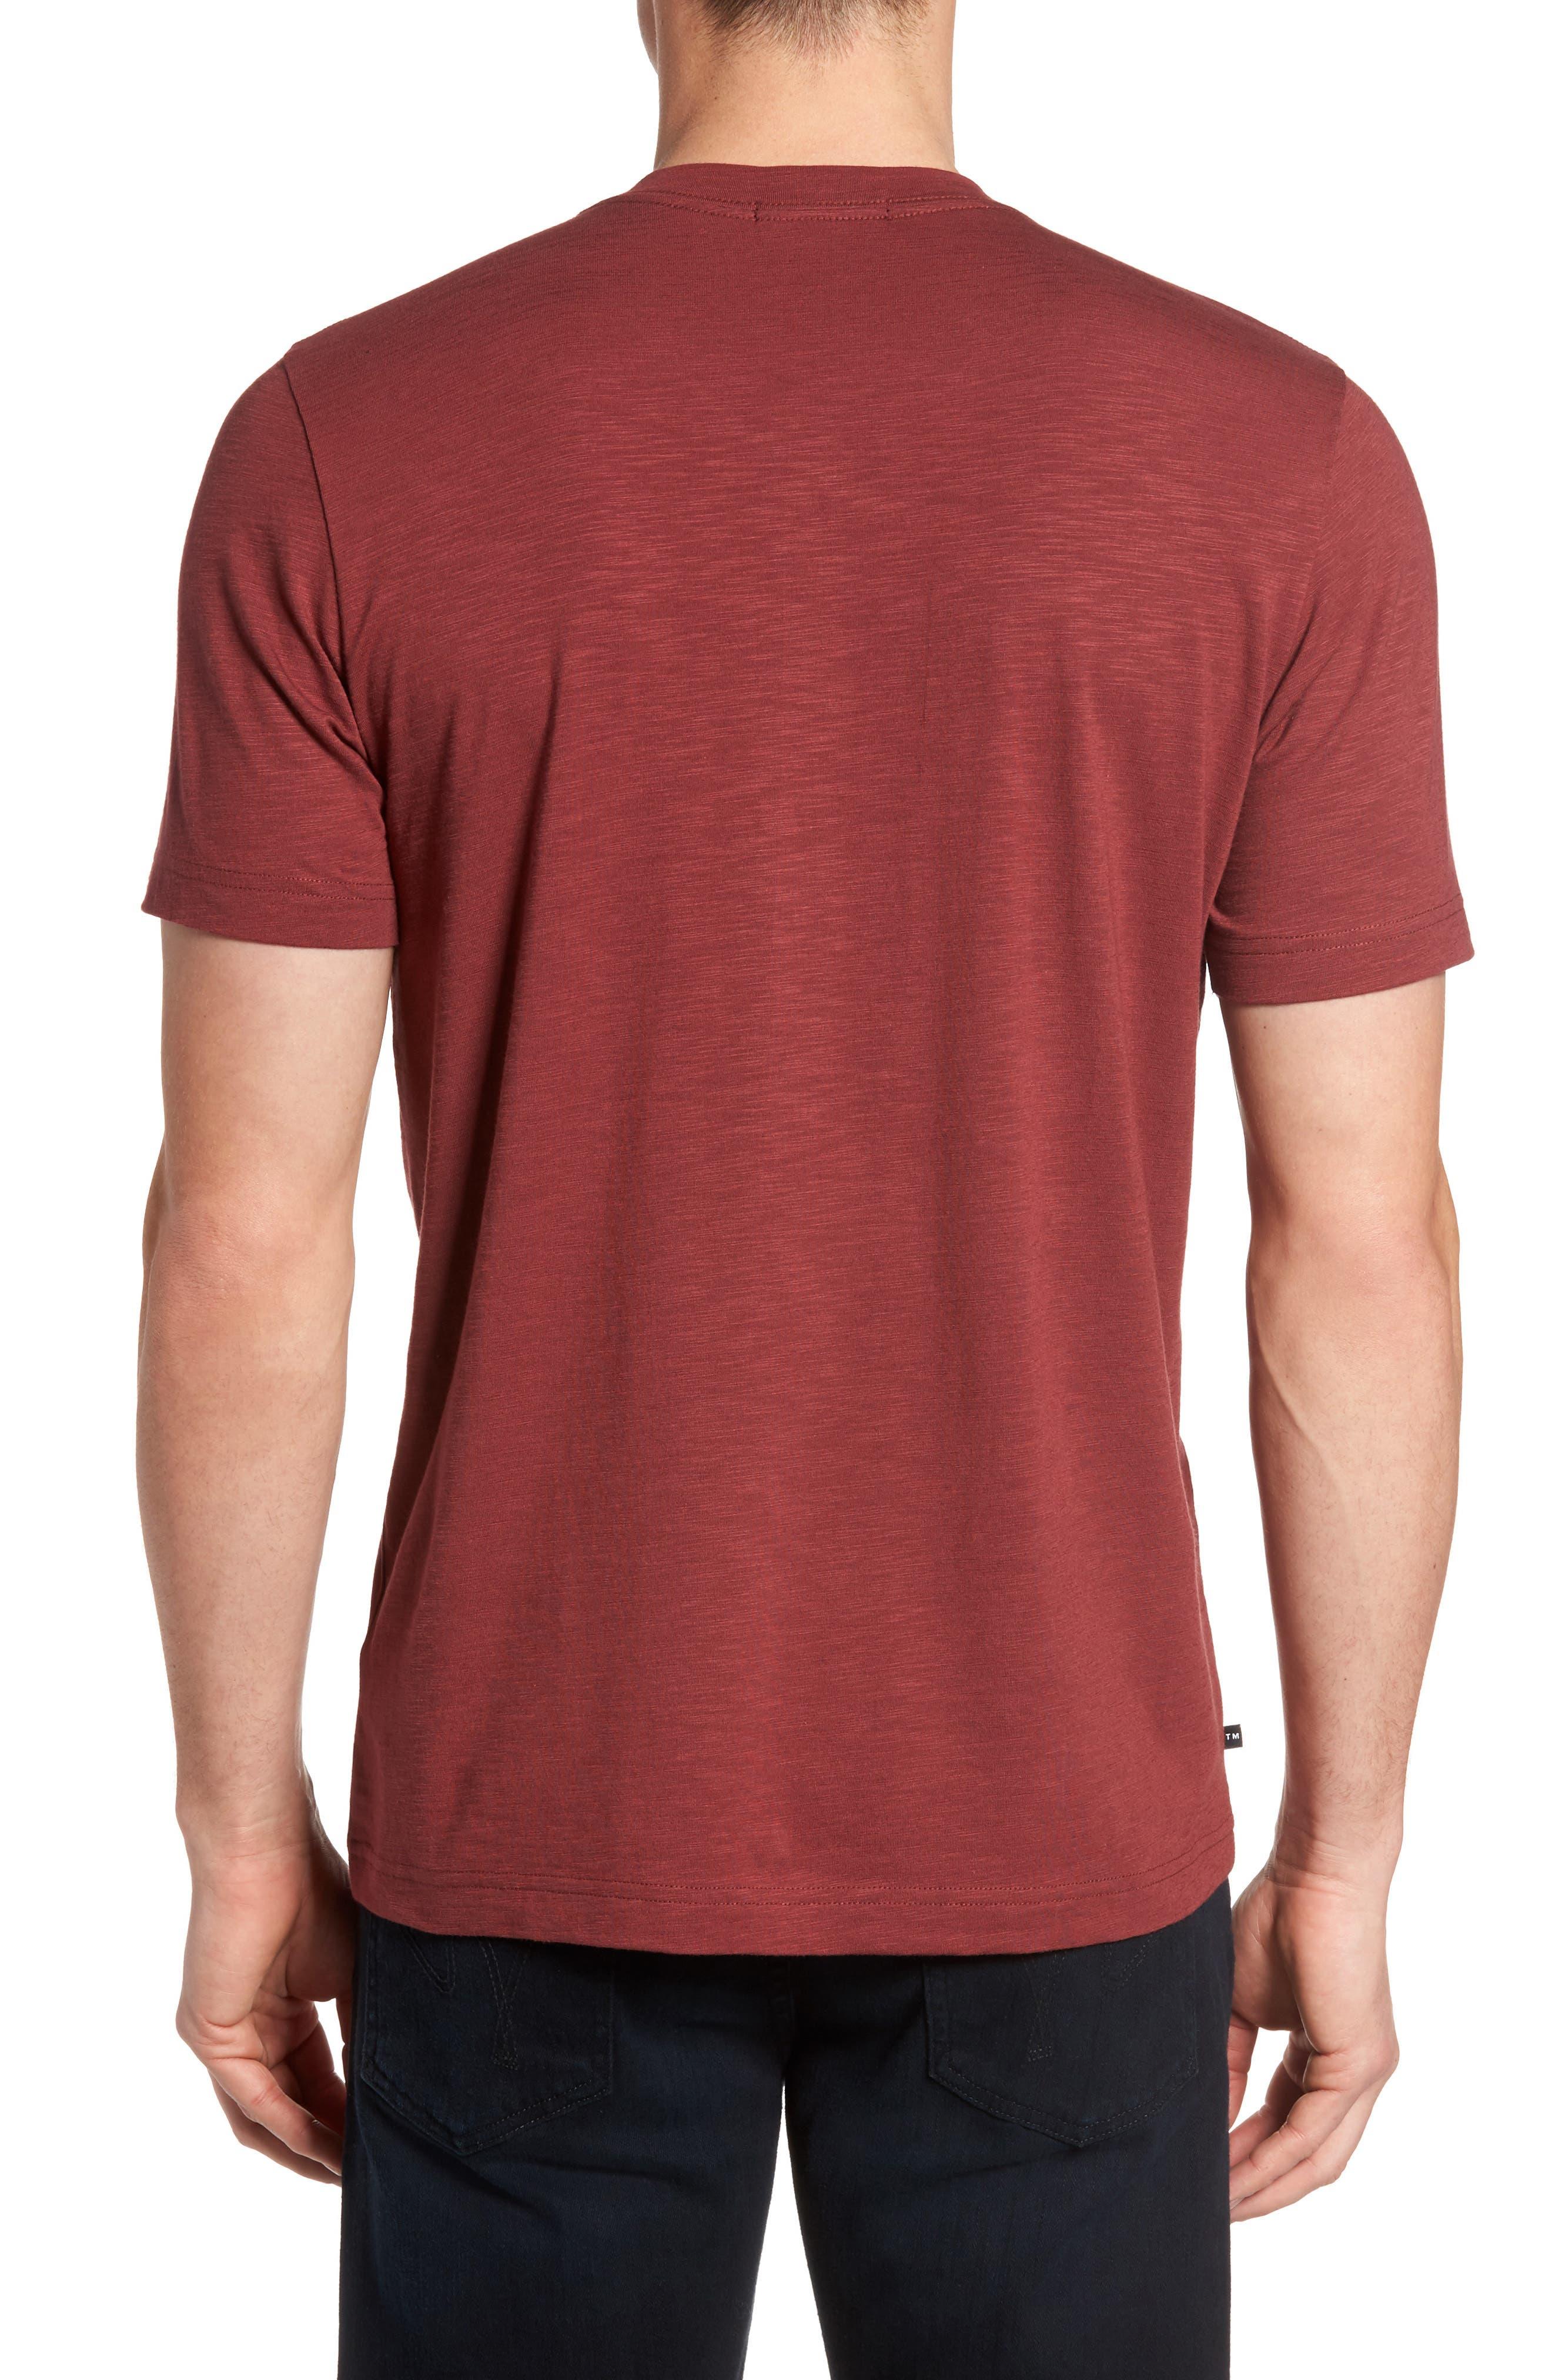 'Trumbull' Trim Fit Slubbed T-Shirt,                             Alternate thumbnail 2, color,                             Oxblood